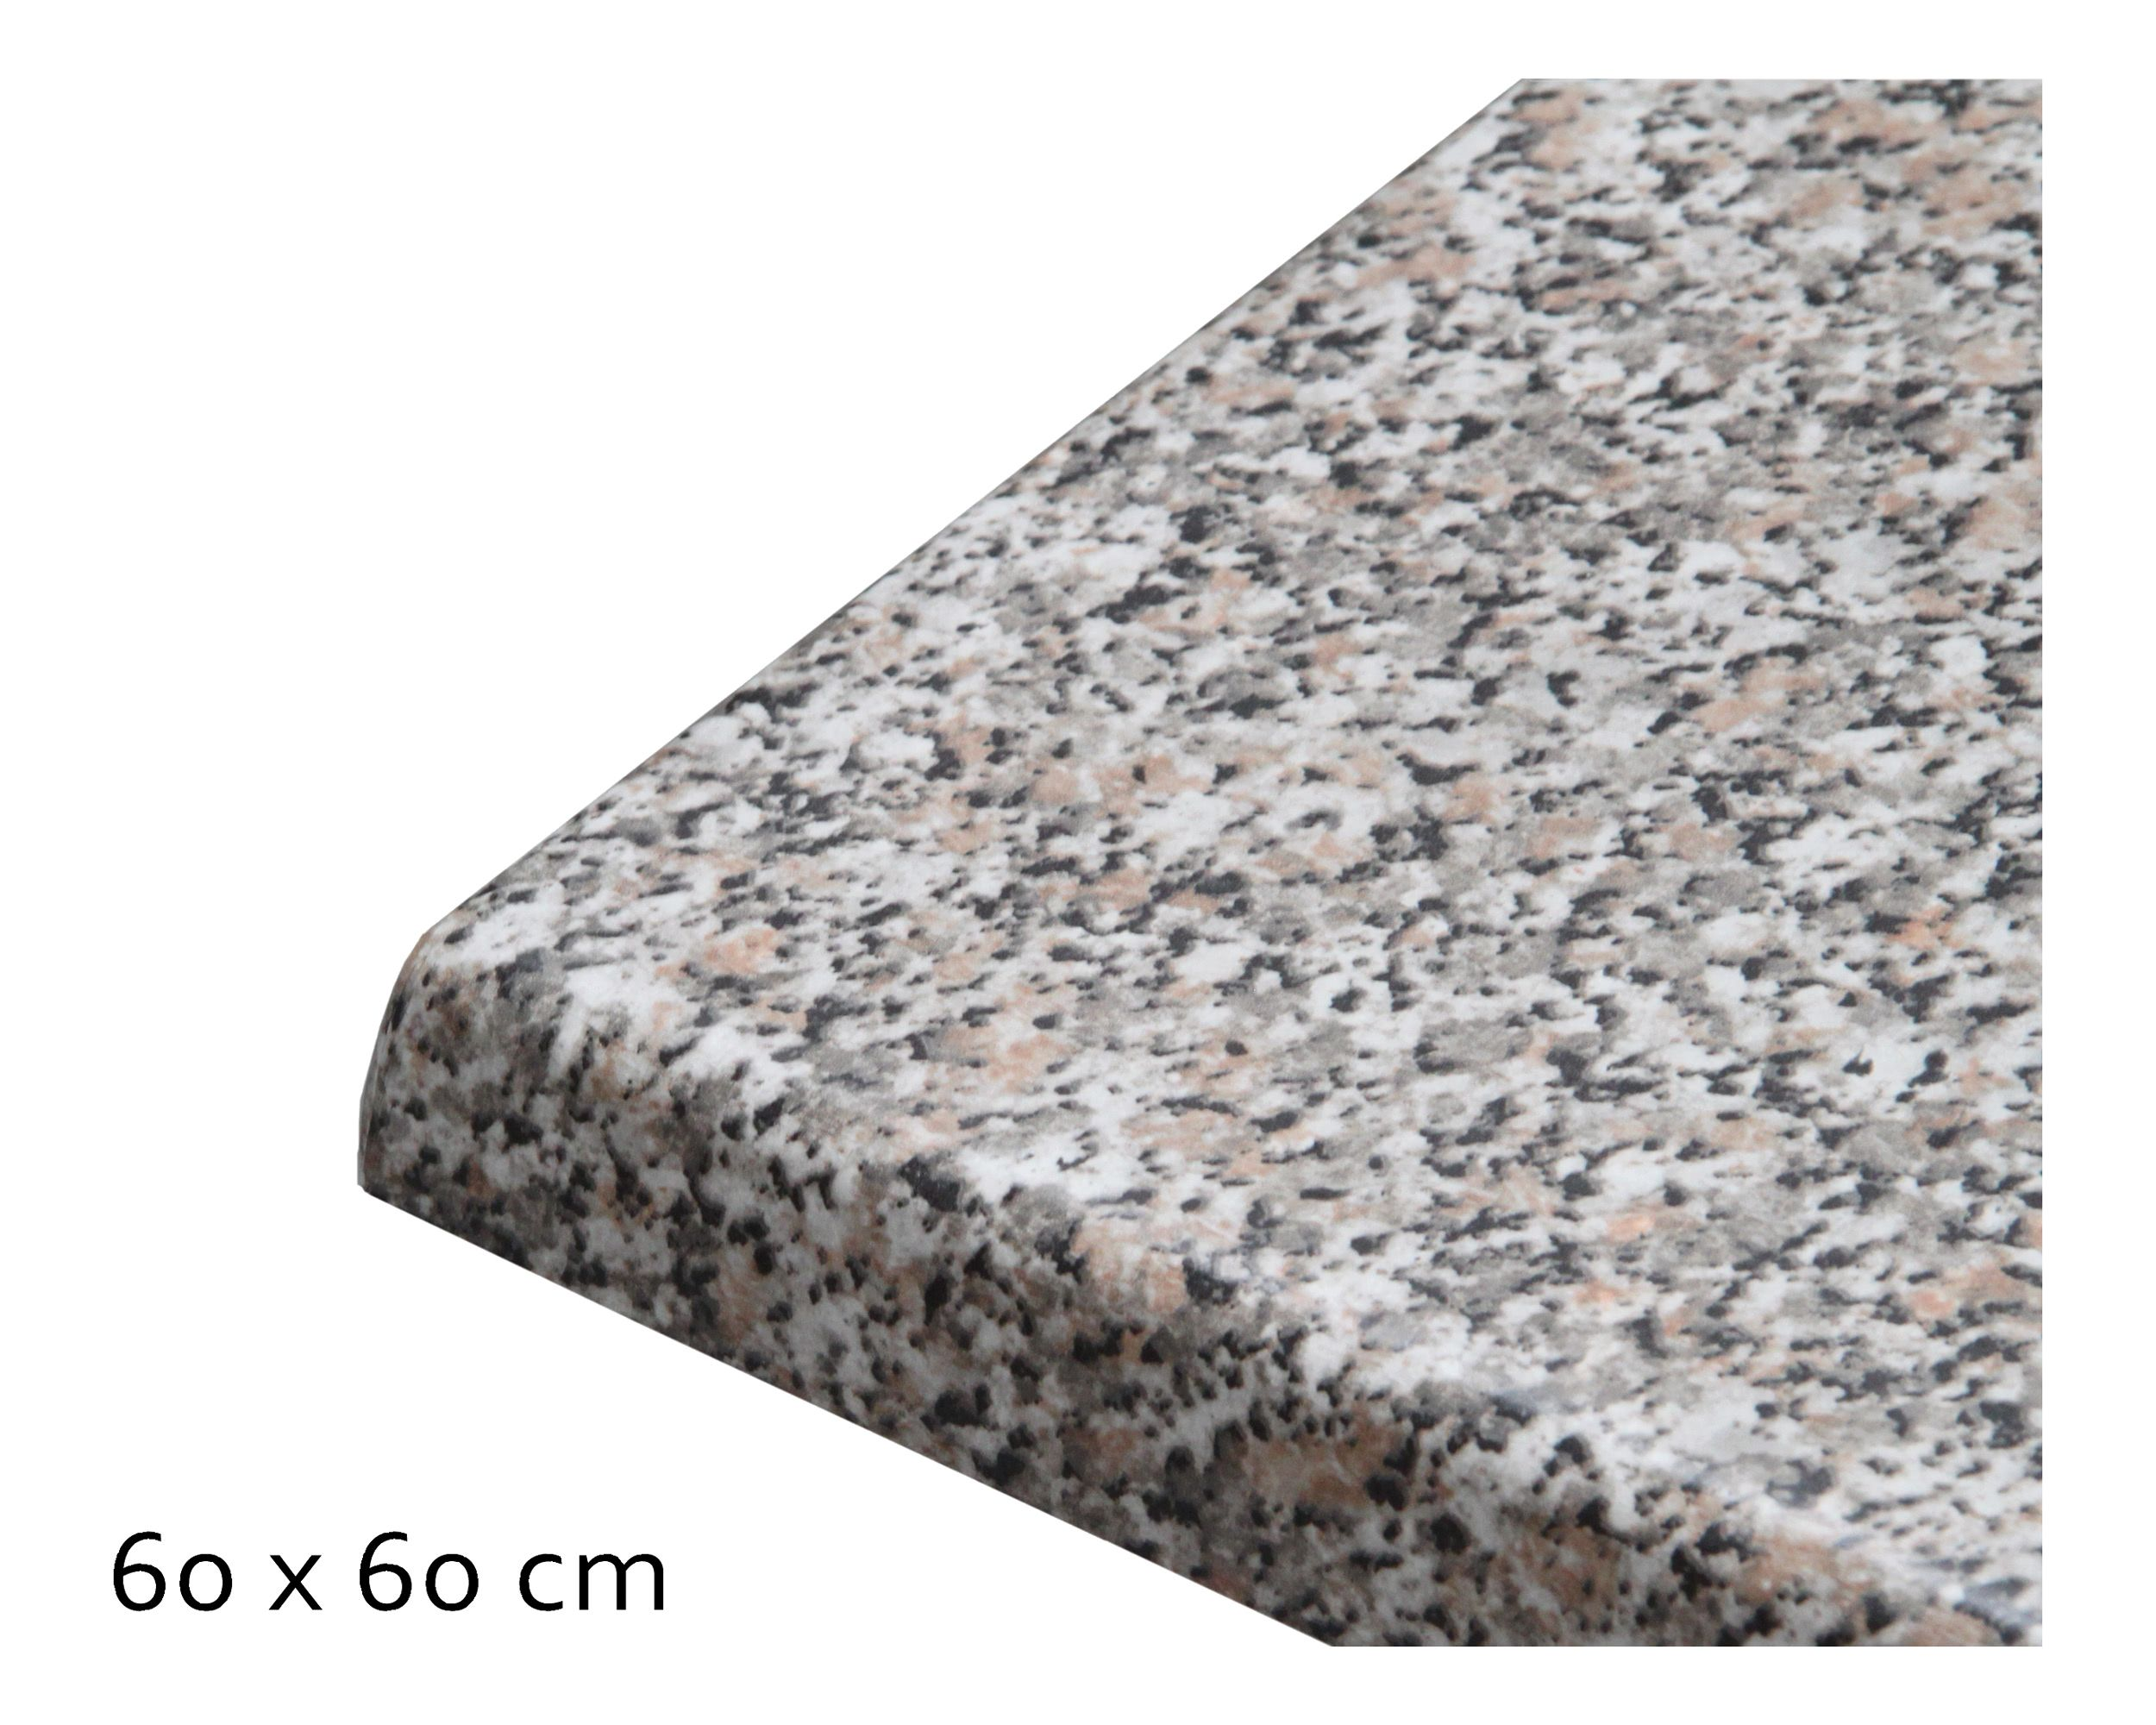 Tischplatte Topalit Standard, 60x60 cm